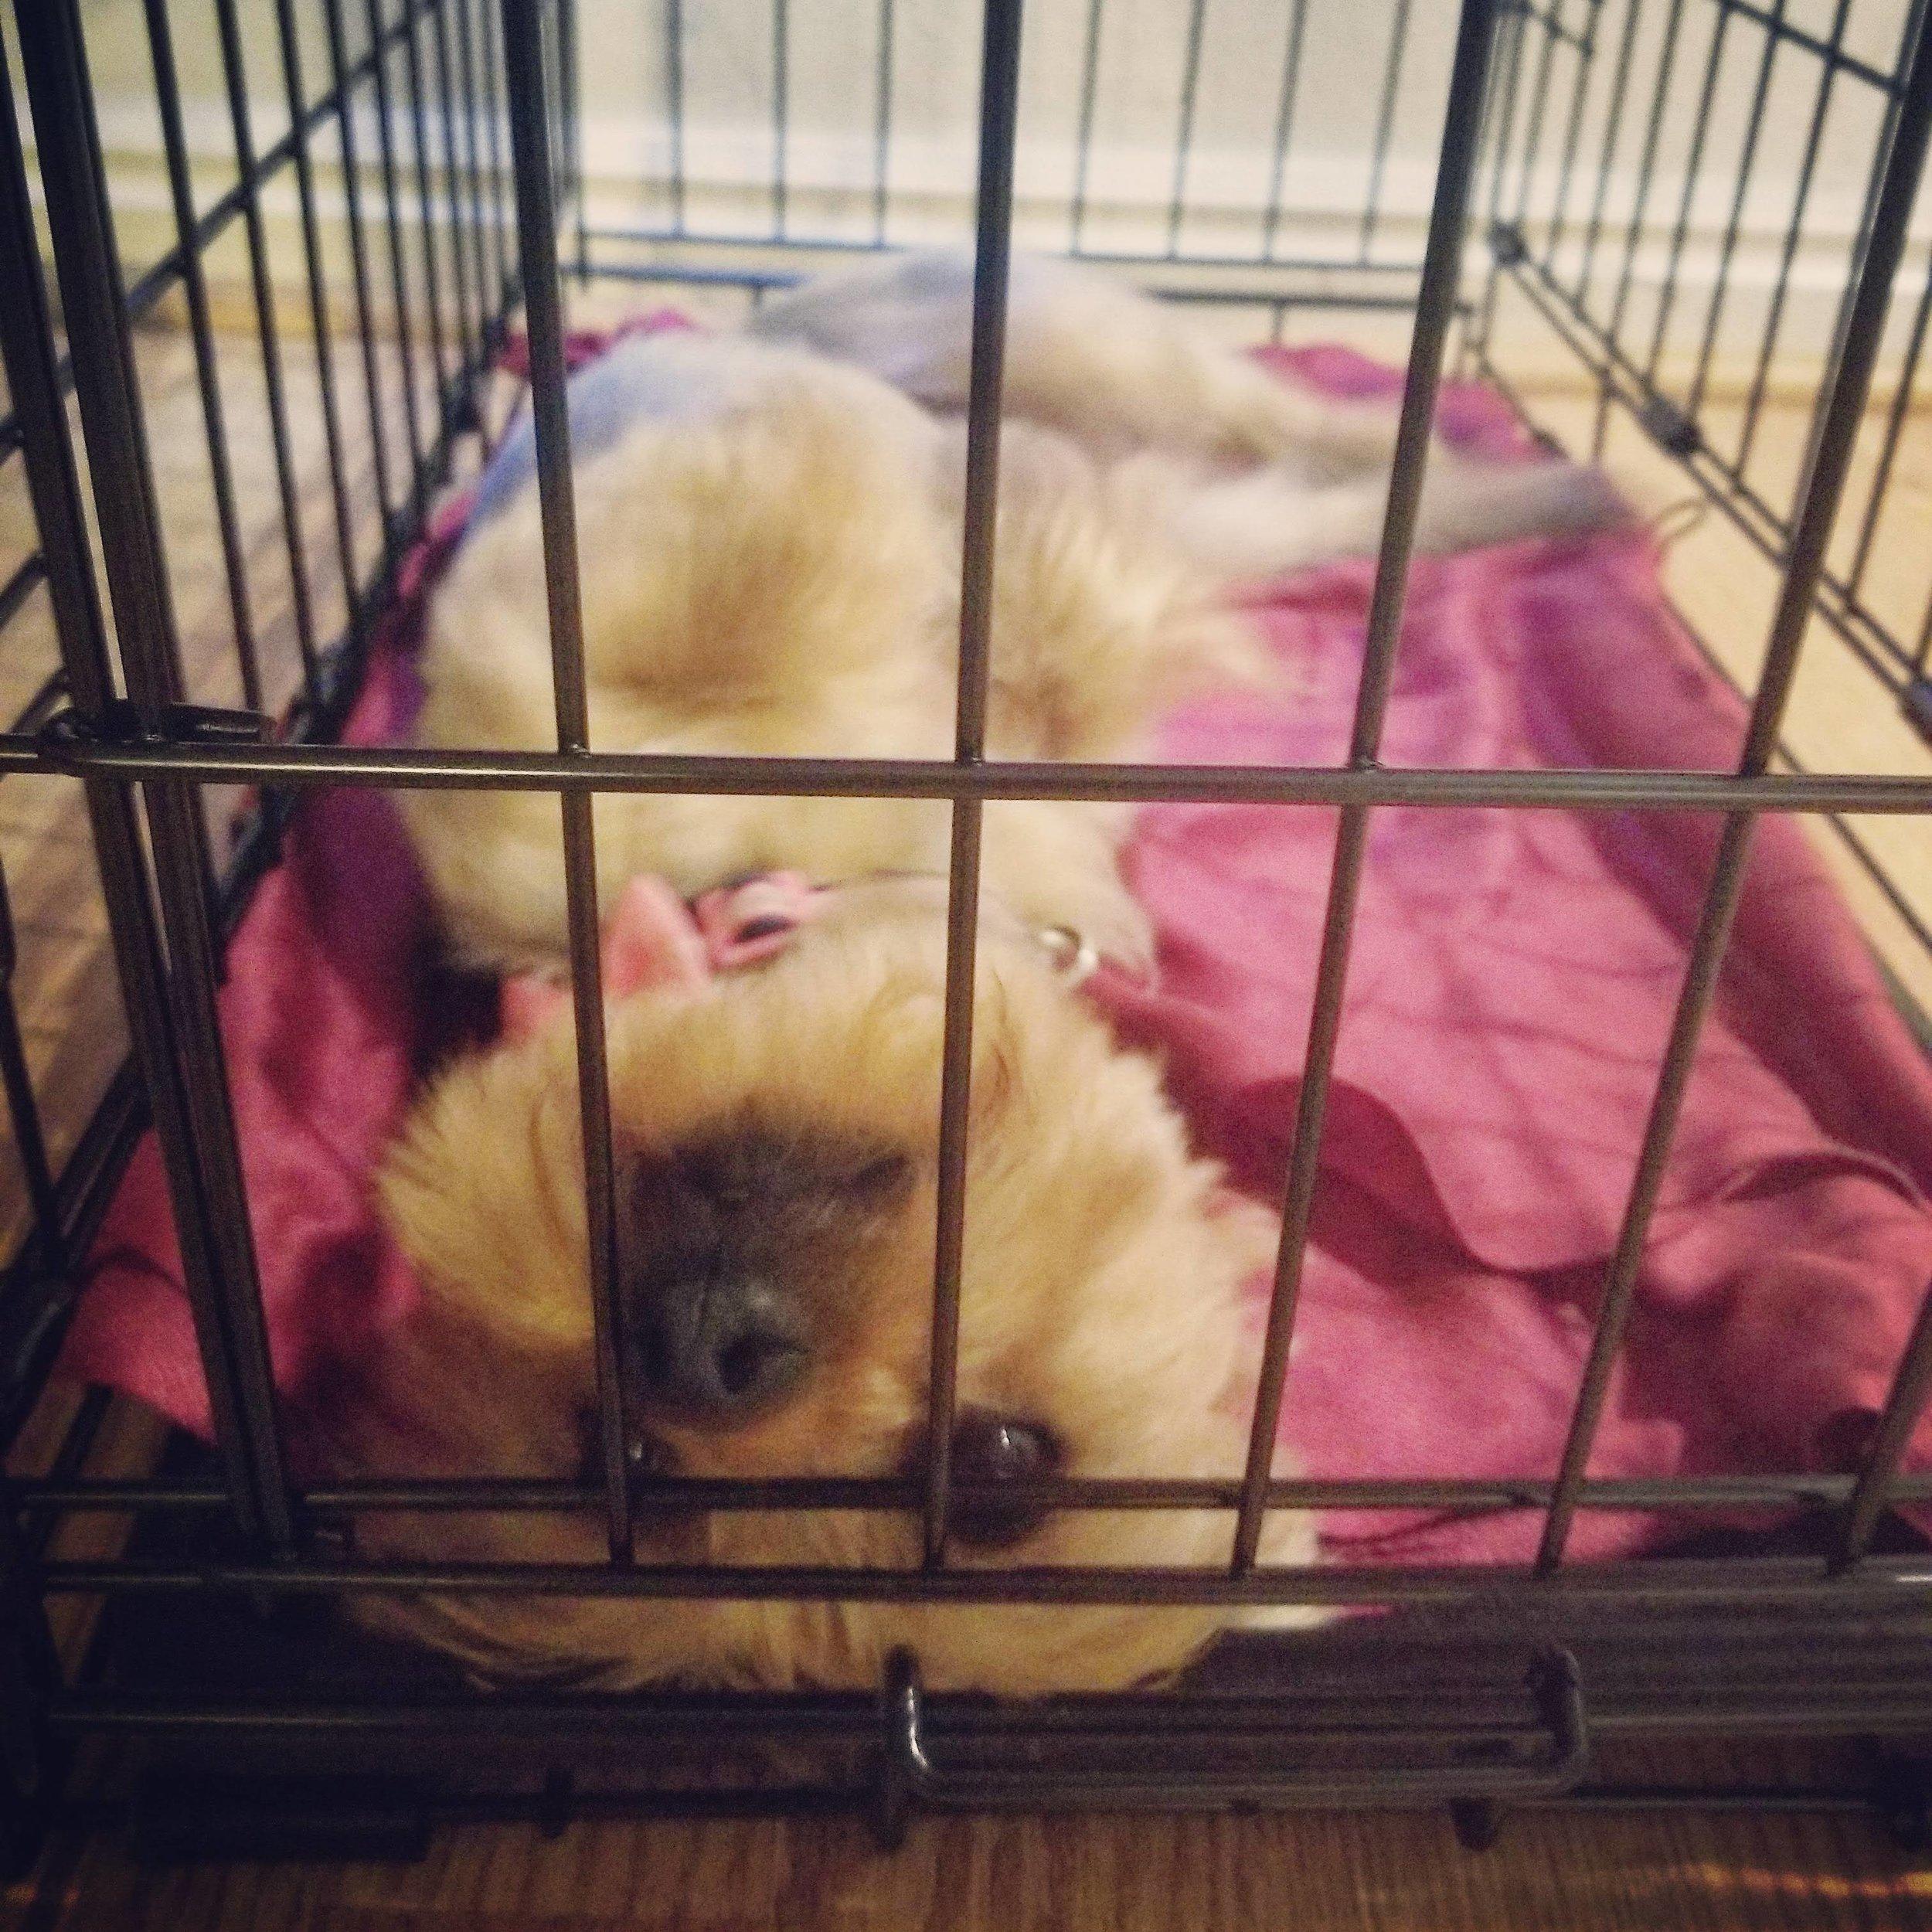 dog training obedience utah county orem trainer